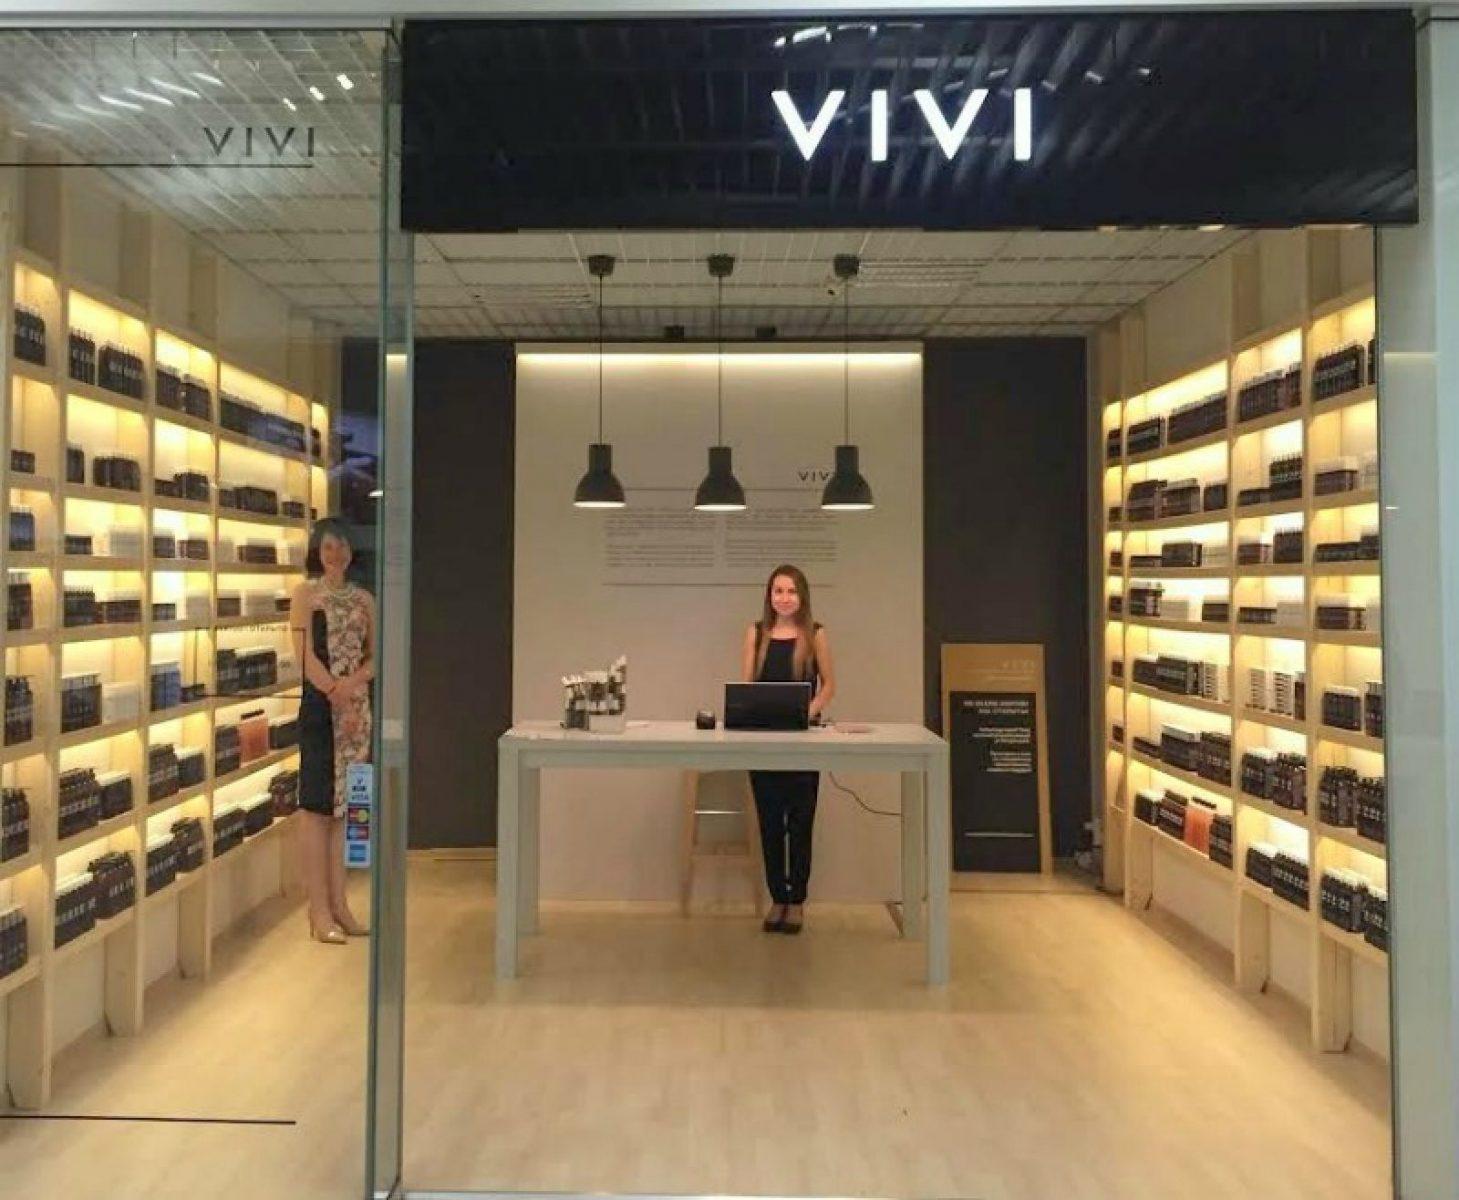 VIVI pood nüüd avatud Tallinnas! / VIVI store now open in Tallinn